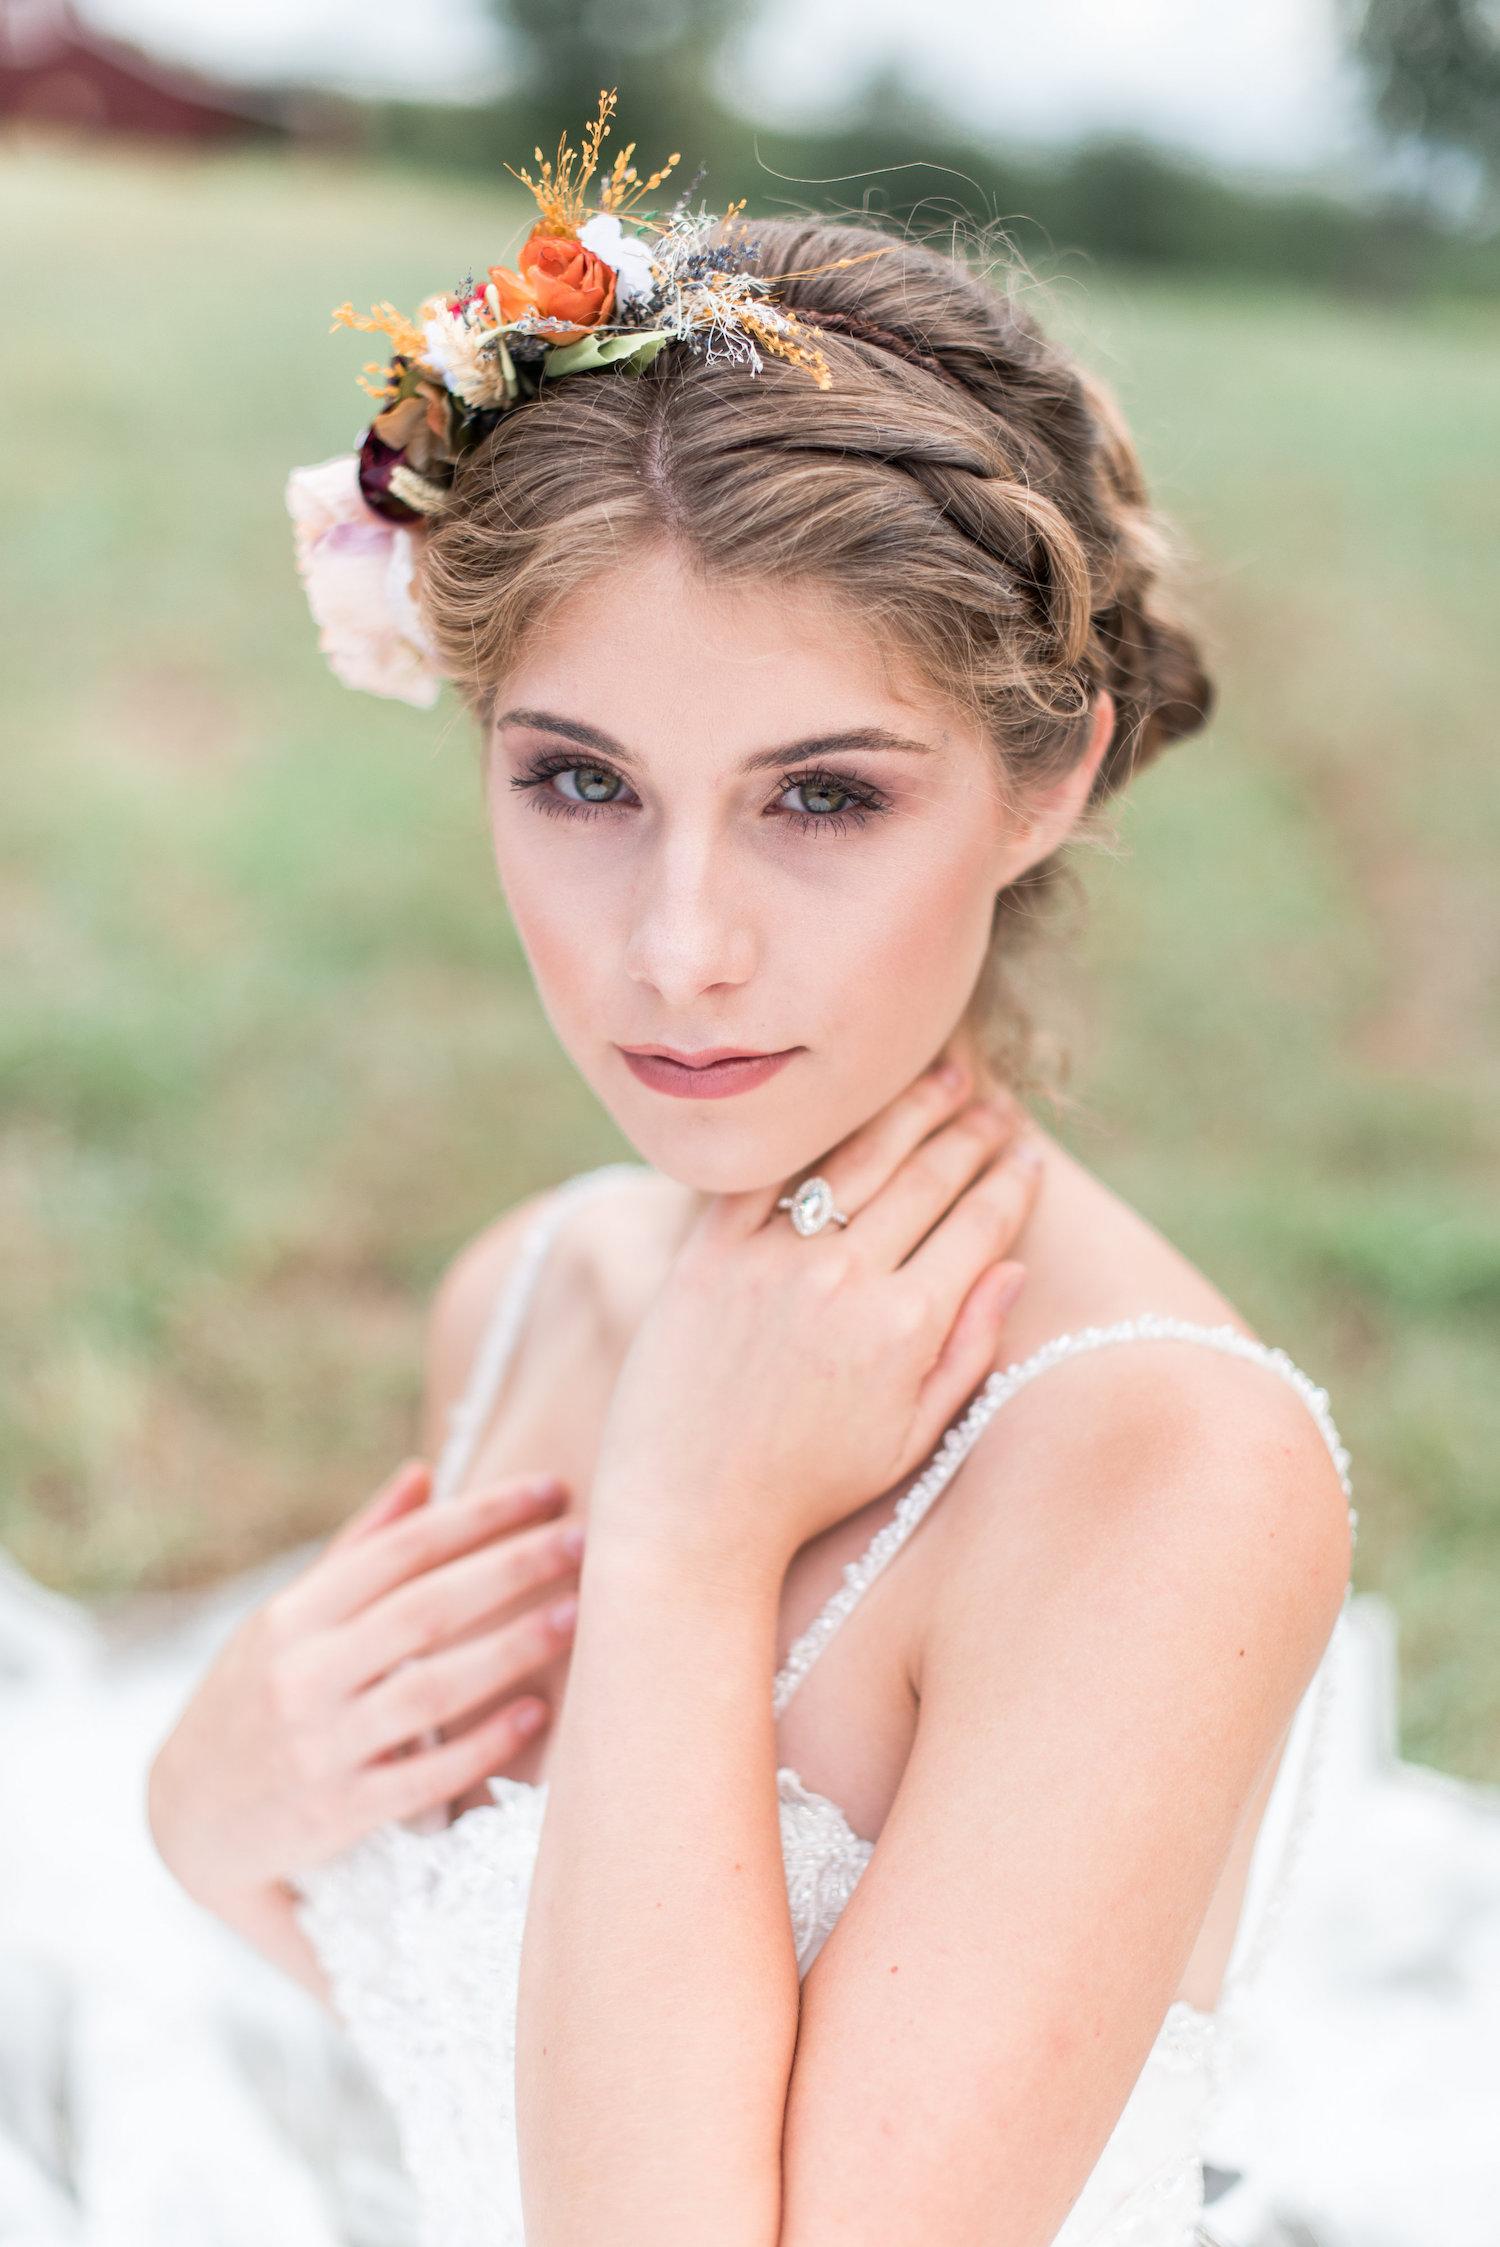 Chloe Heaver